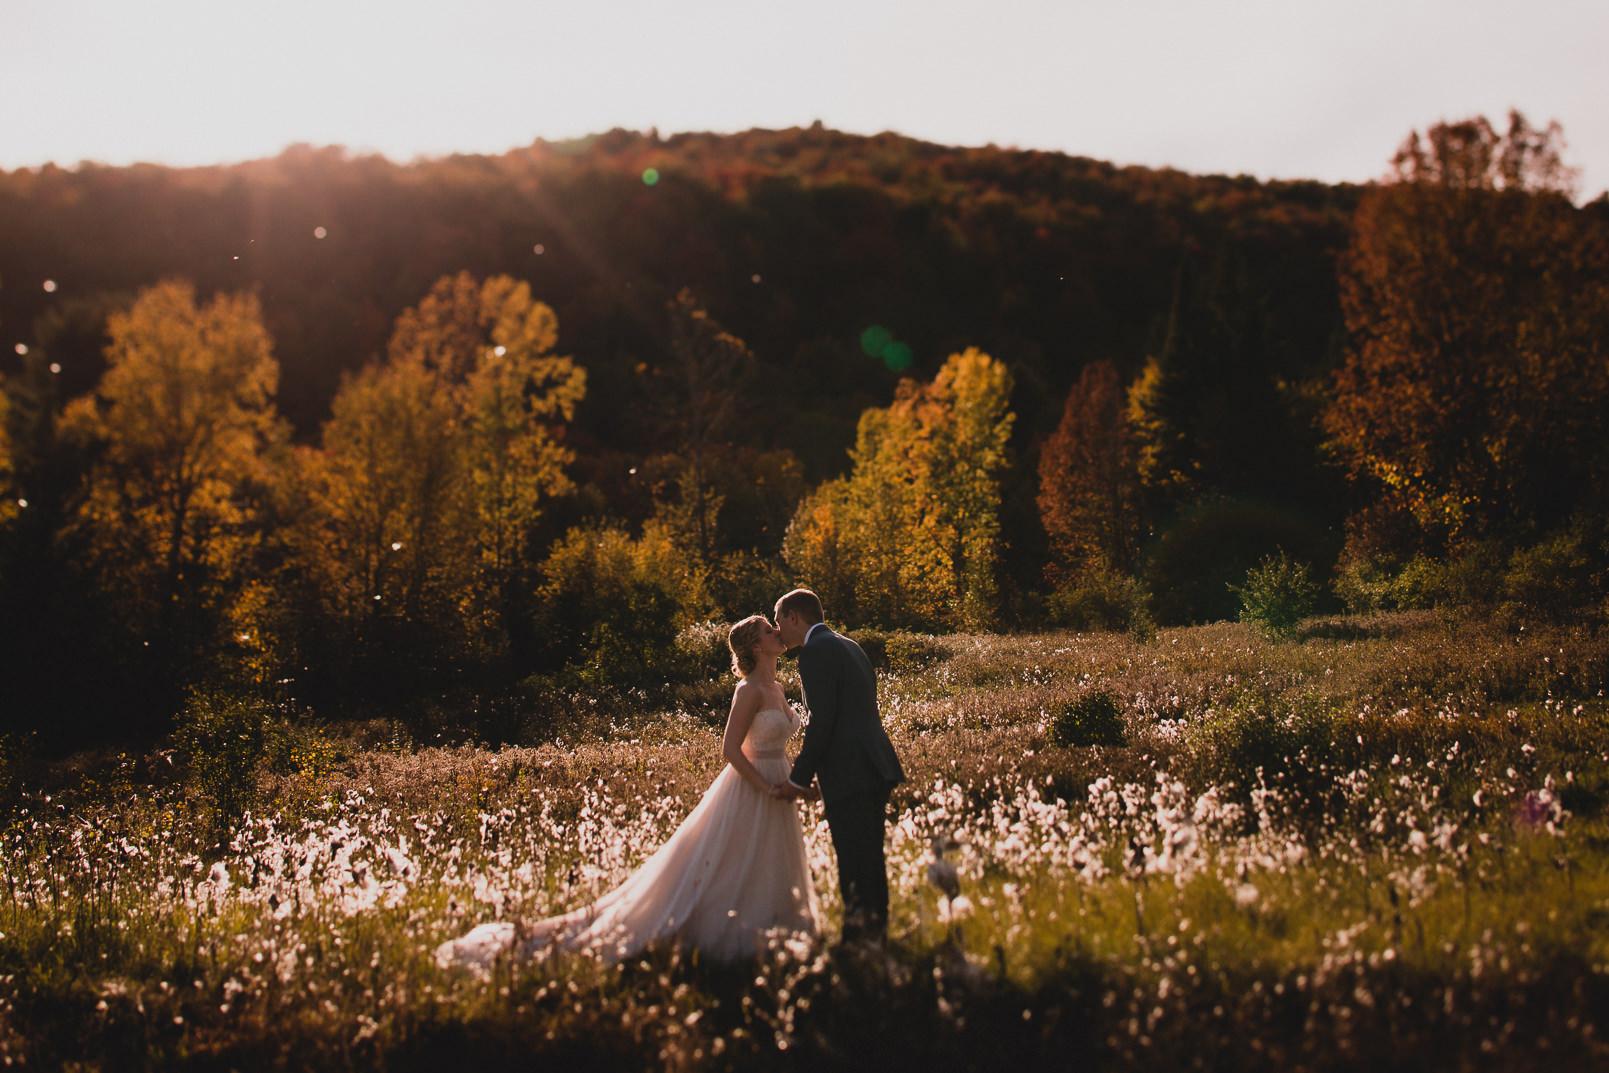 017-Jonathan-Kuhn-Photography-Wedding-_mini.jpg